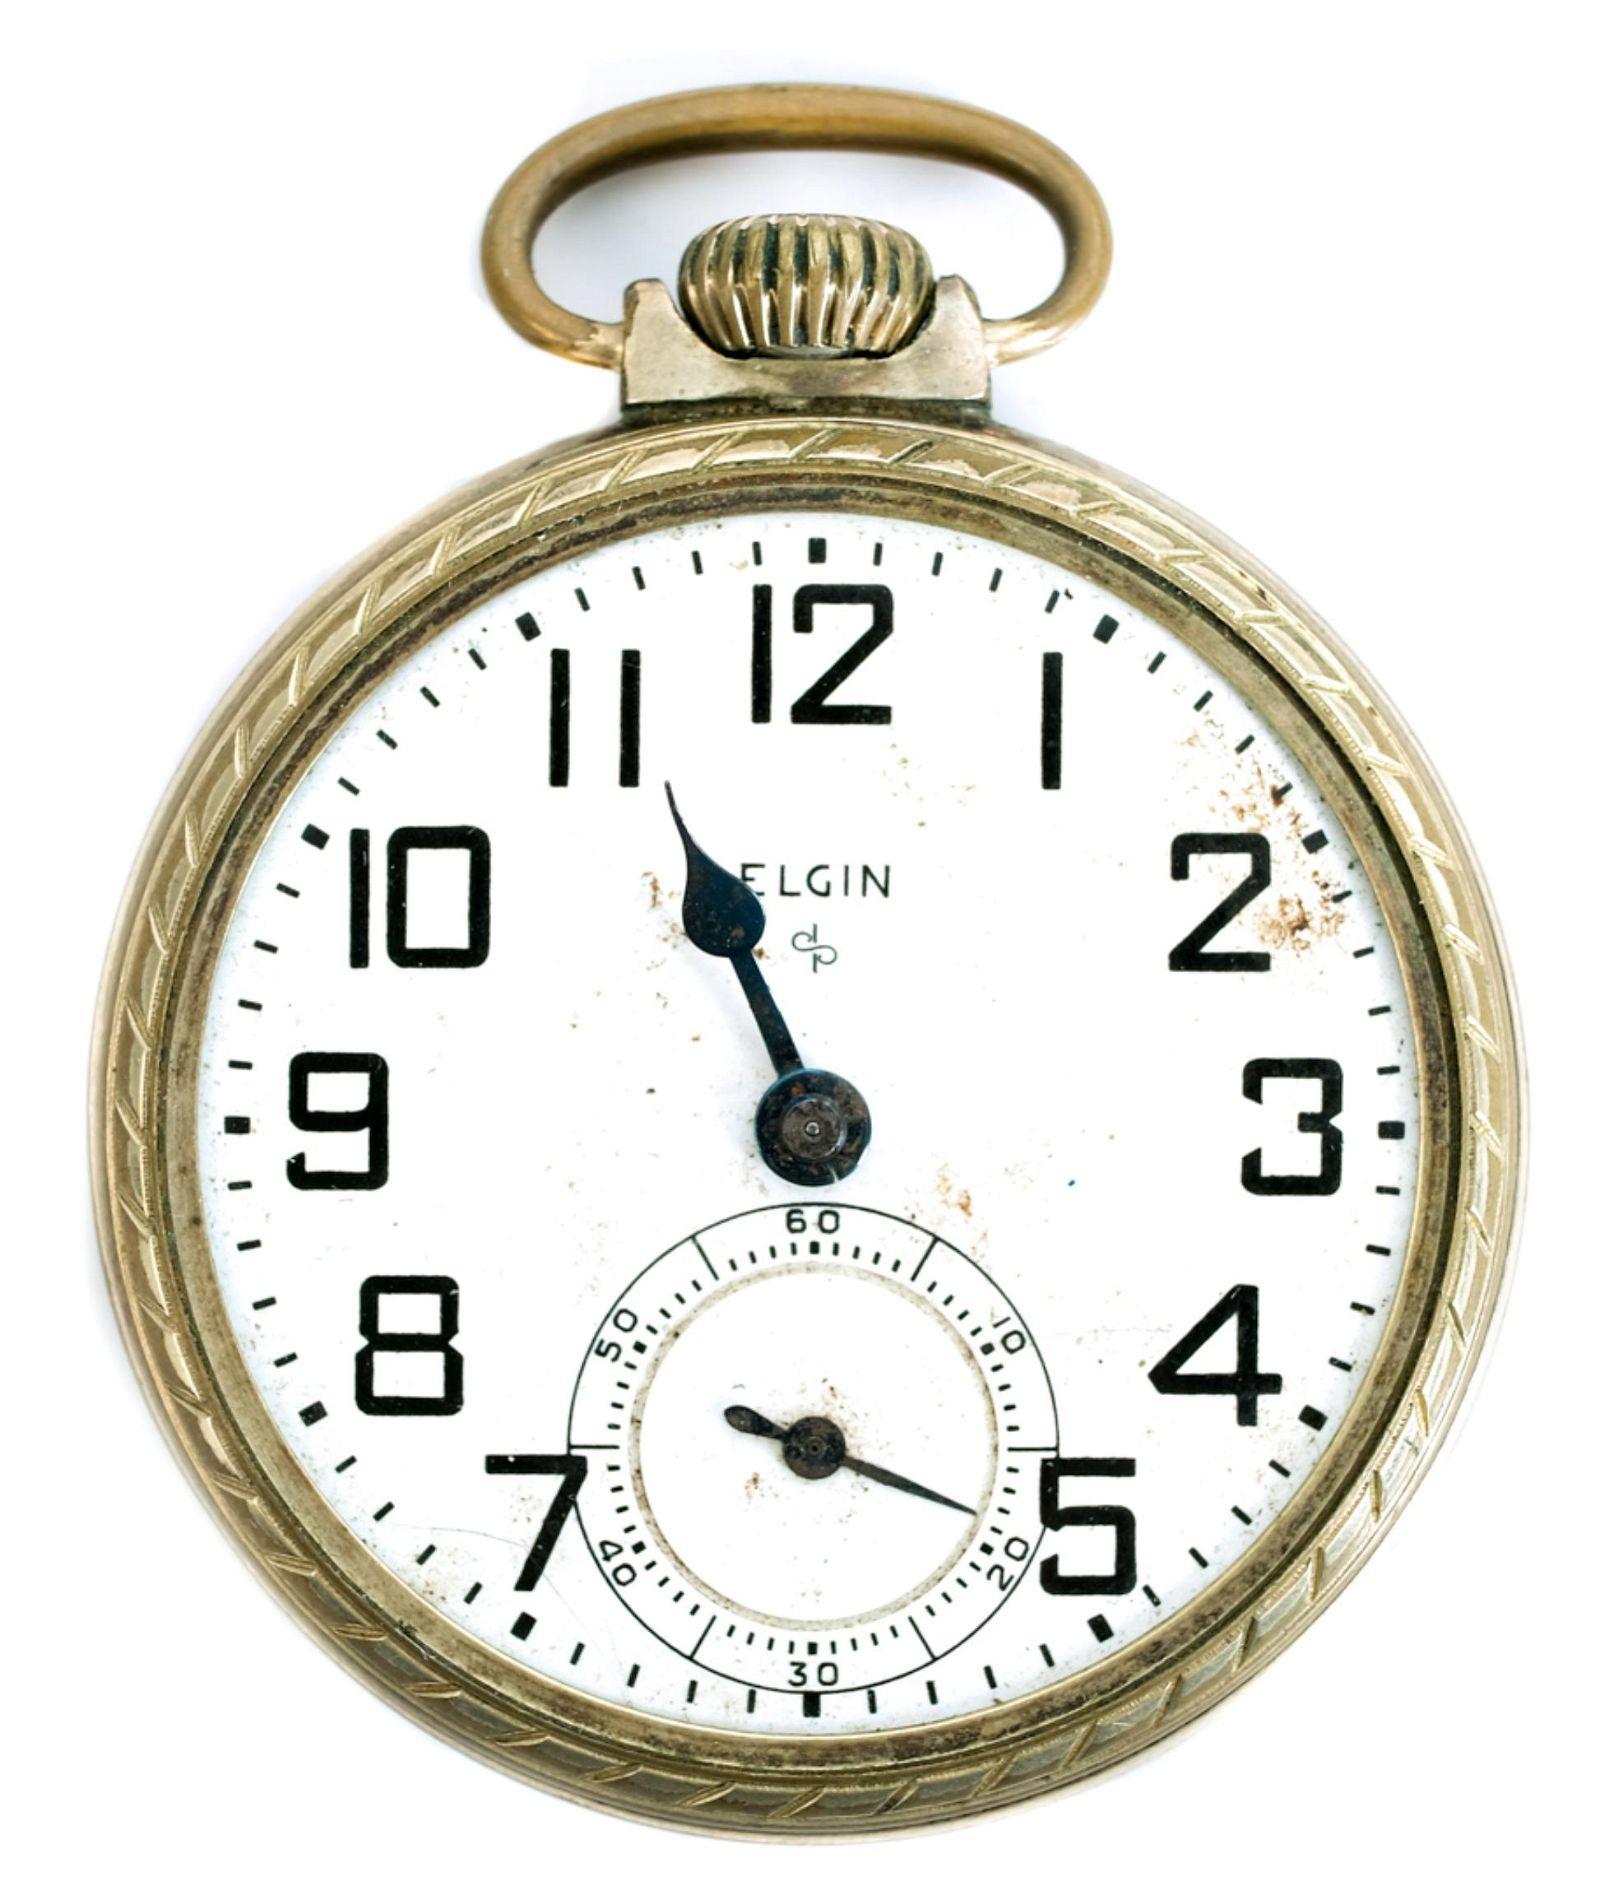 Elgin Model 575 Rolled Gold Open Face Pocket Watch